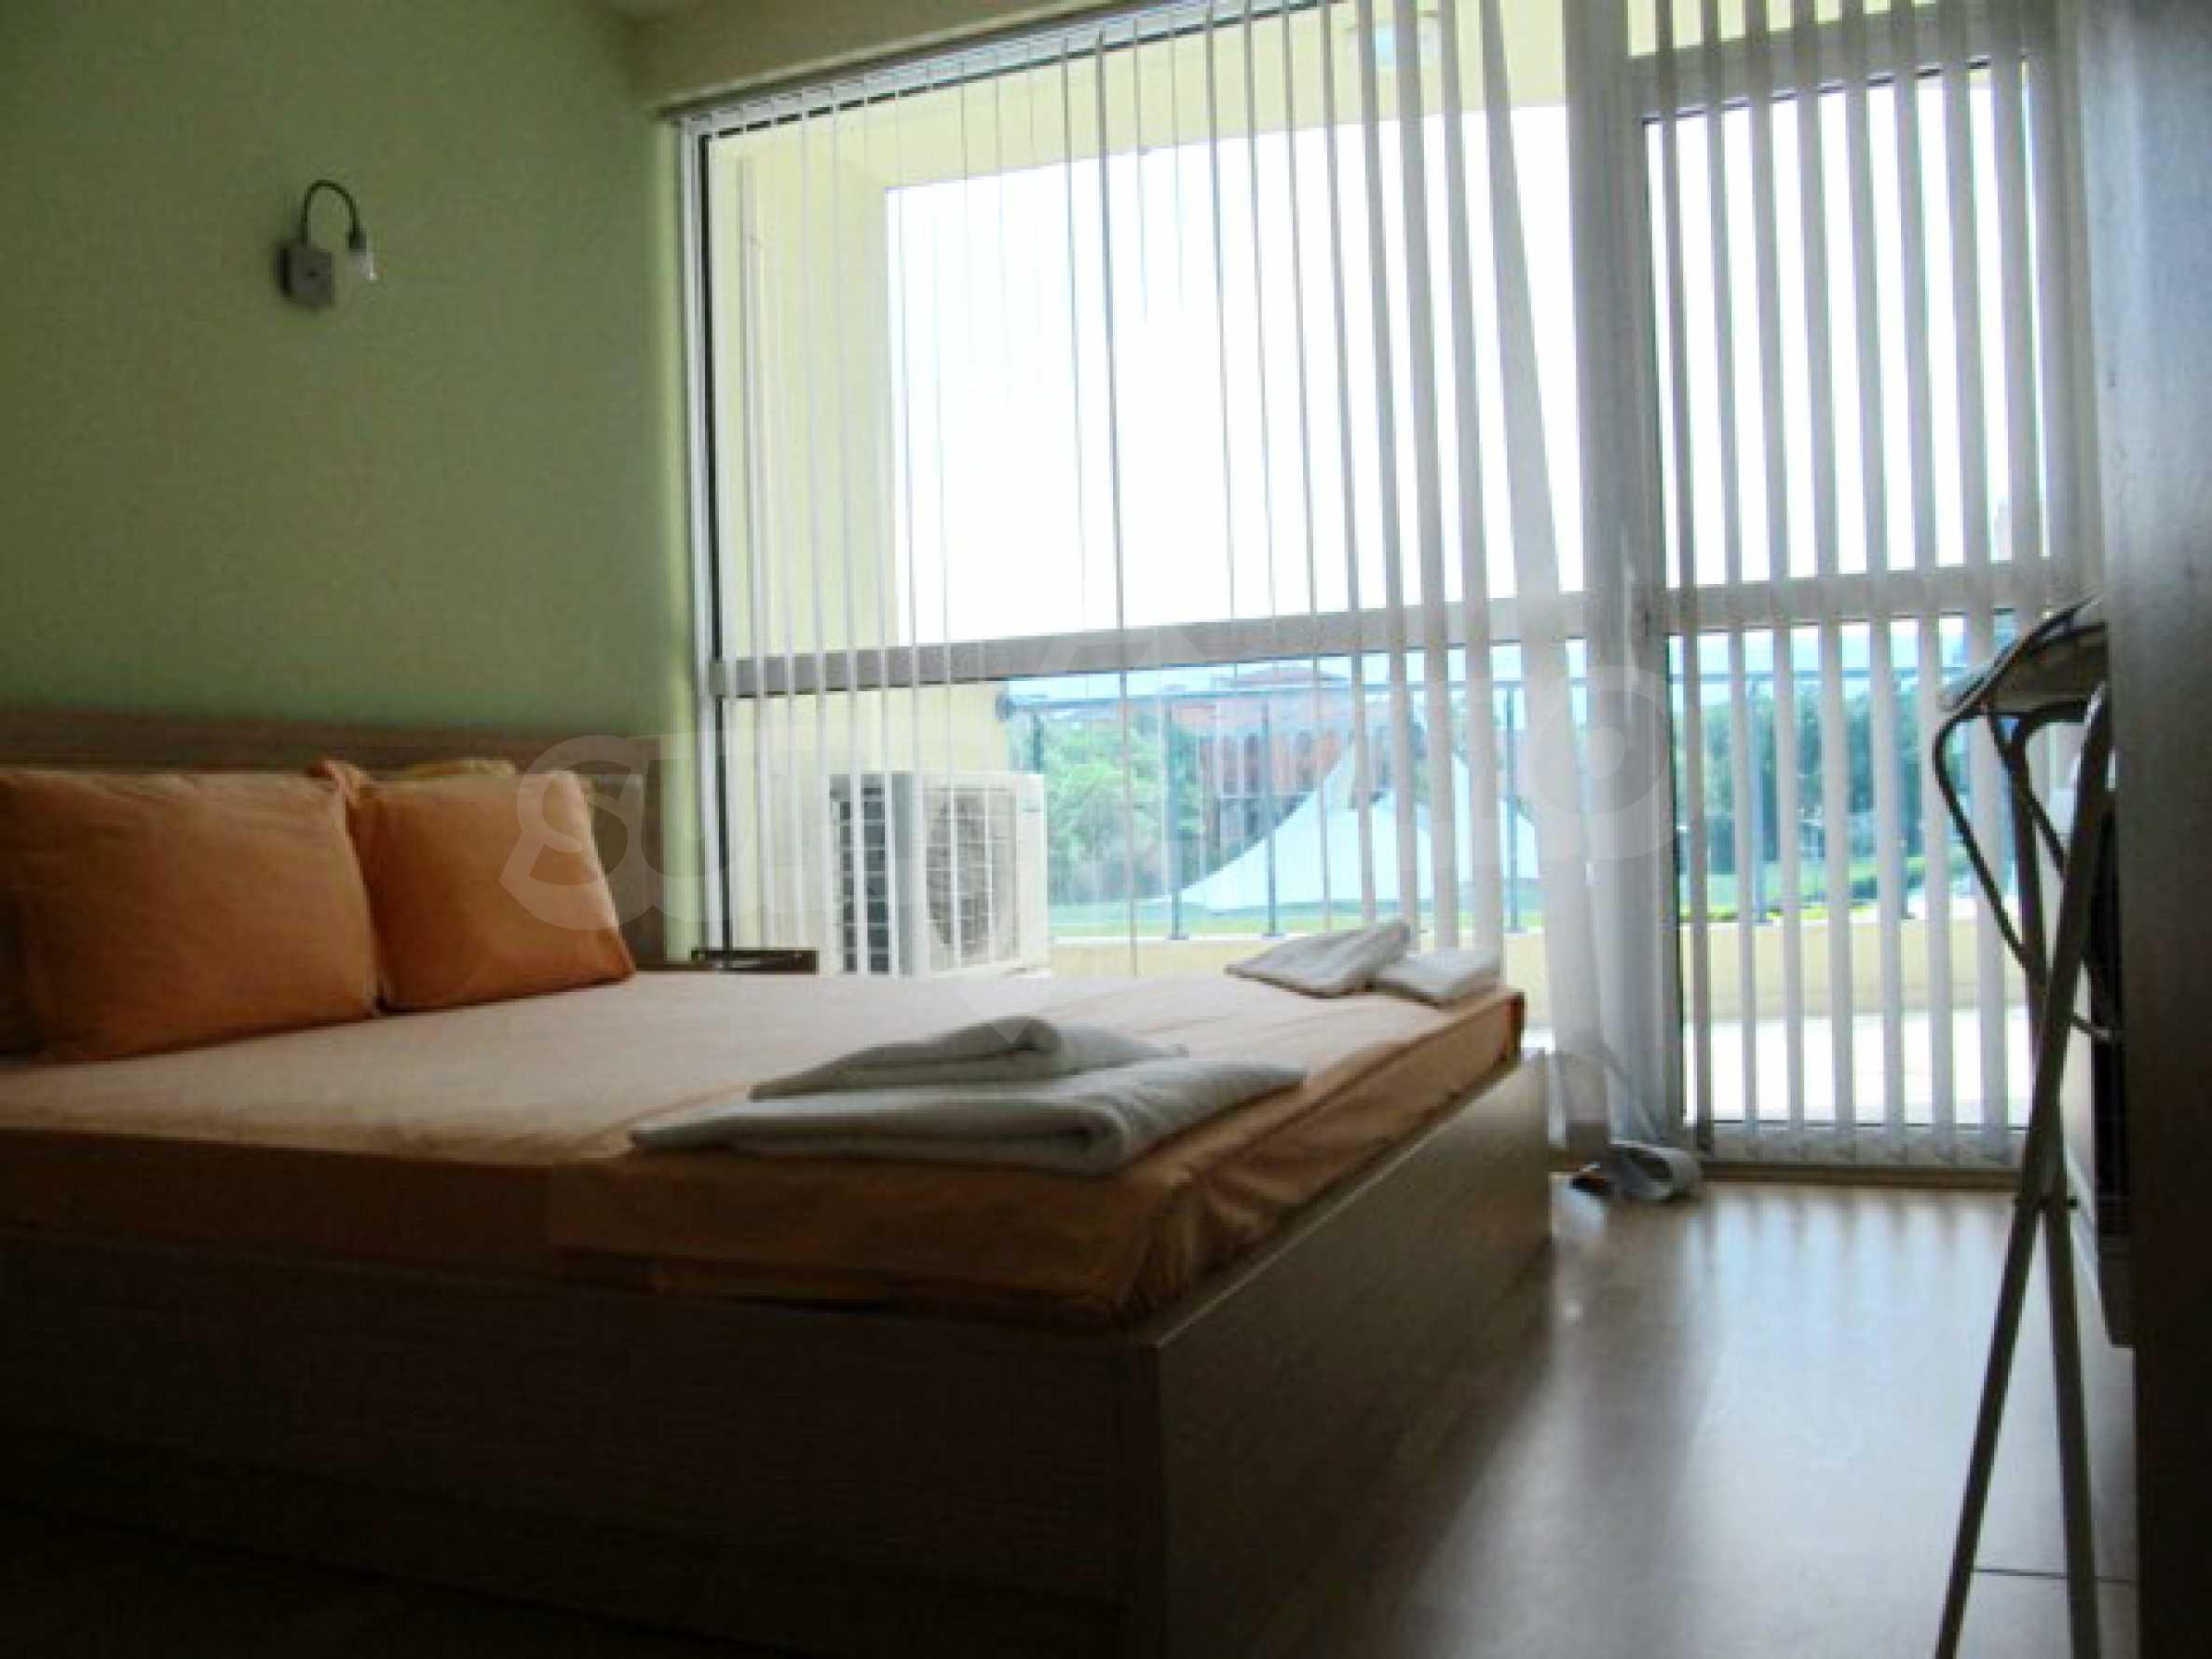 Тристаен апартамент за продажба в Поморие 12